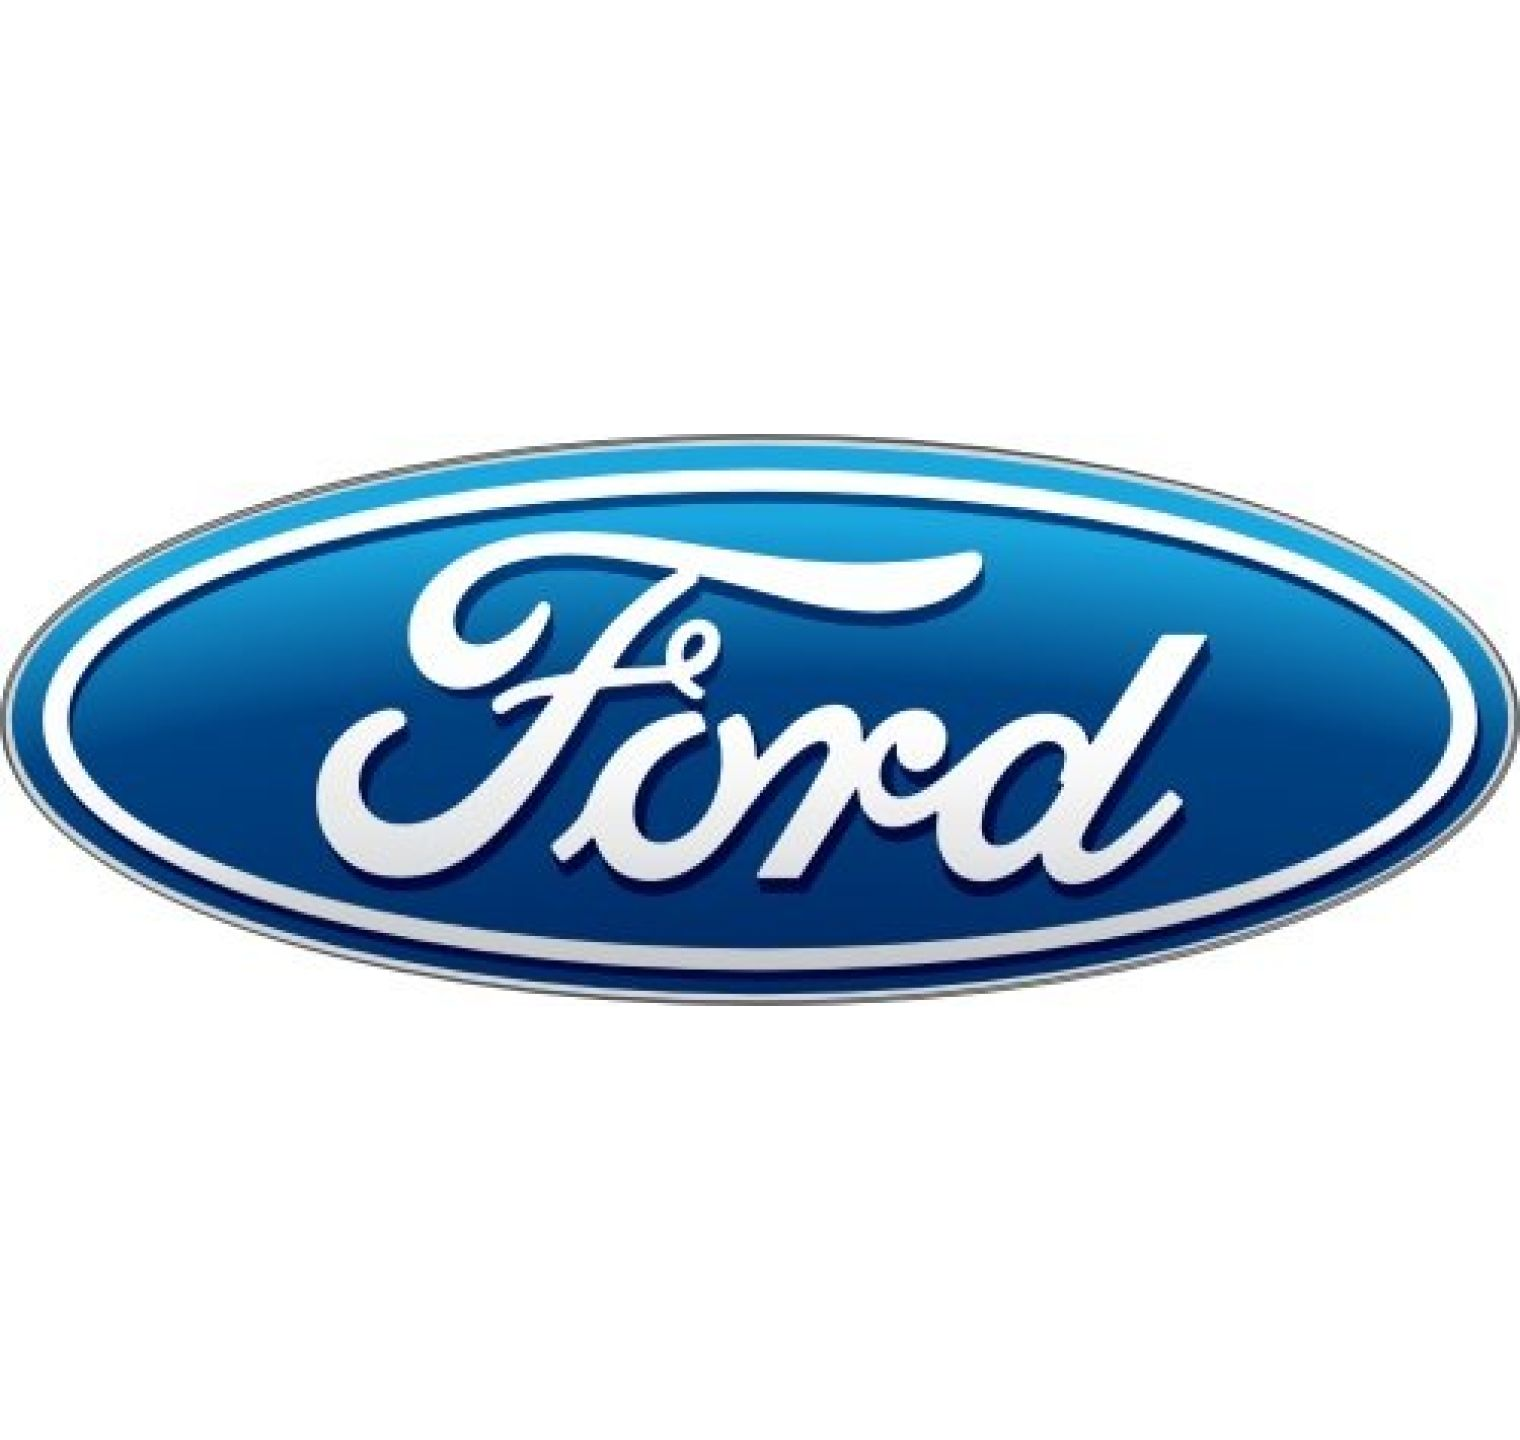 Ford S-max (vanaf 2018) - set ruitenwissers Valeo Silencio AquaBlade